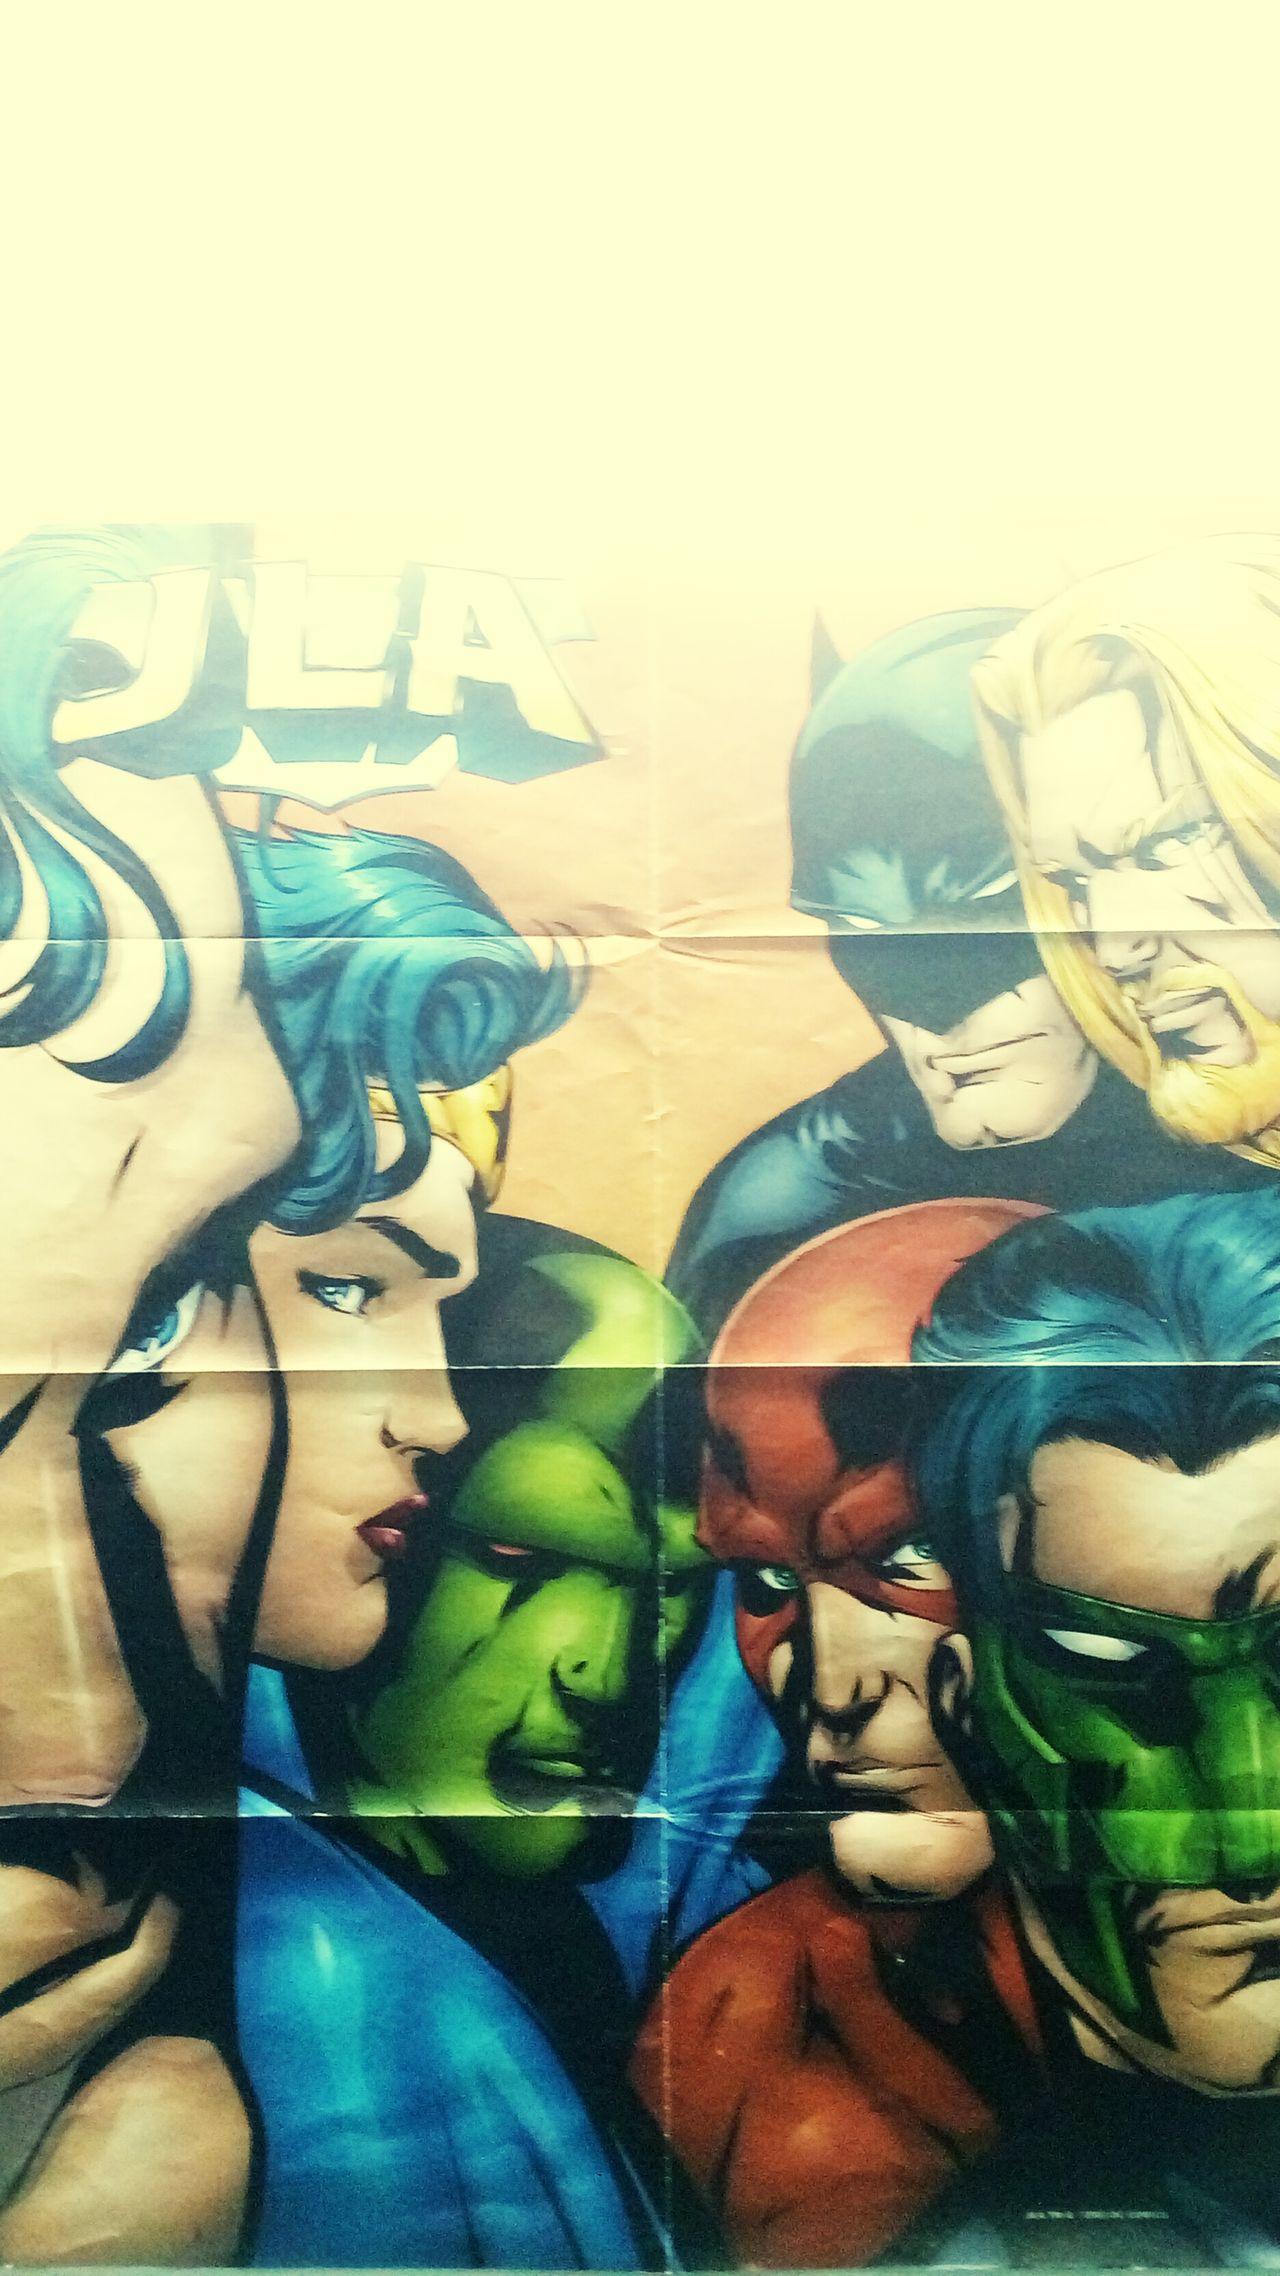 JLA Posters DC Wall Art Batman Superman Wonder Woman Aquaman THE MANHUNTER Flash Green Lantern